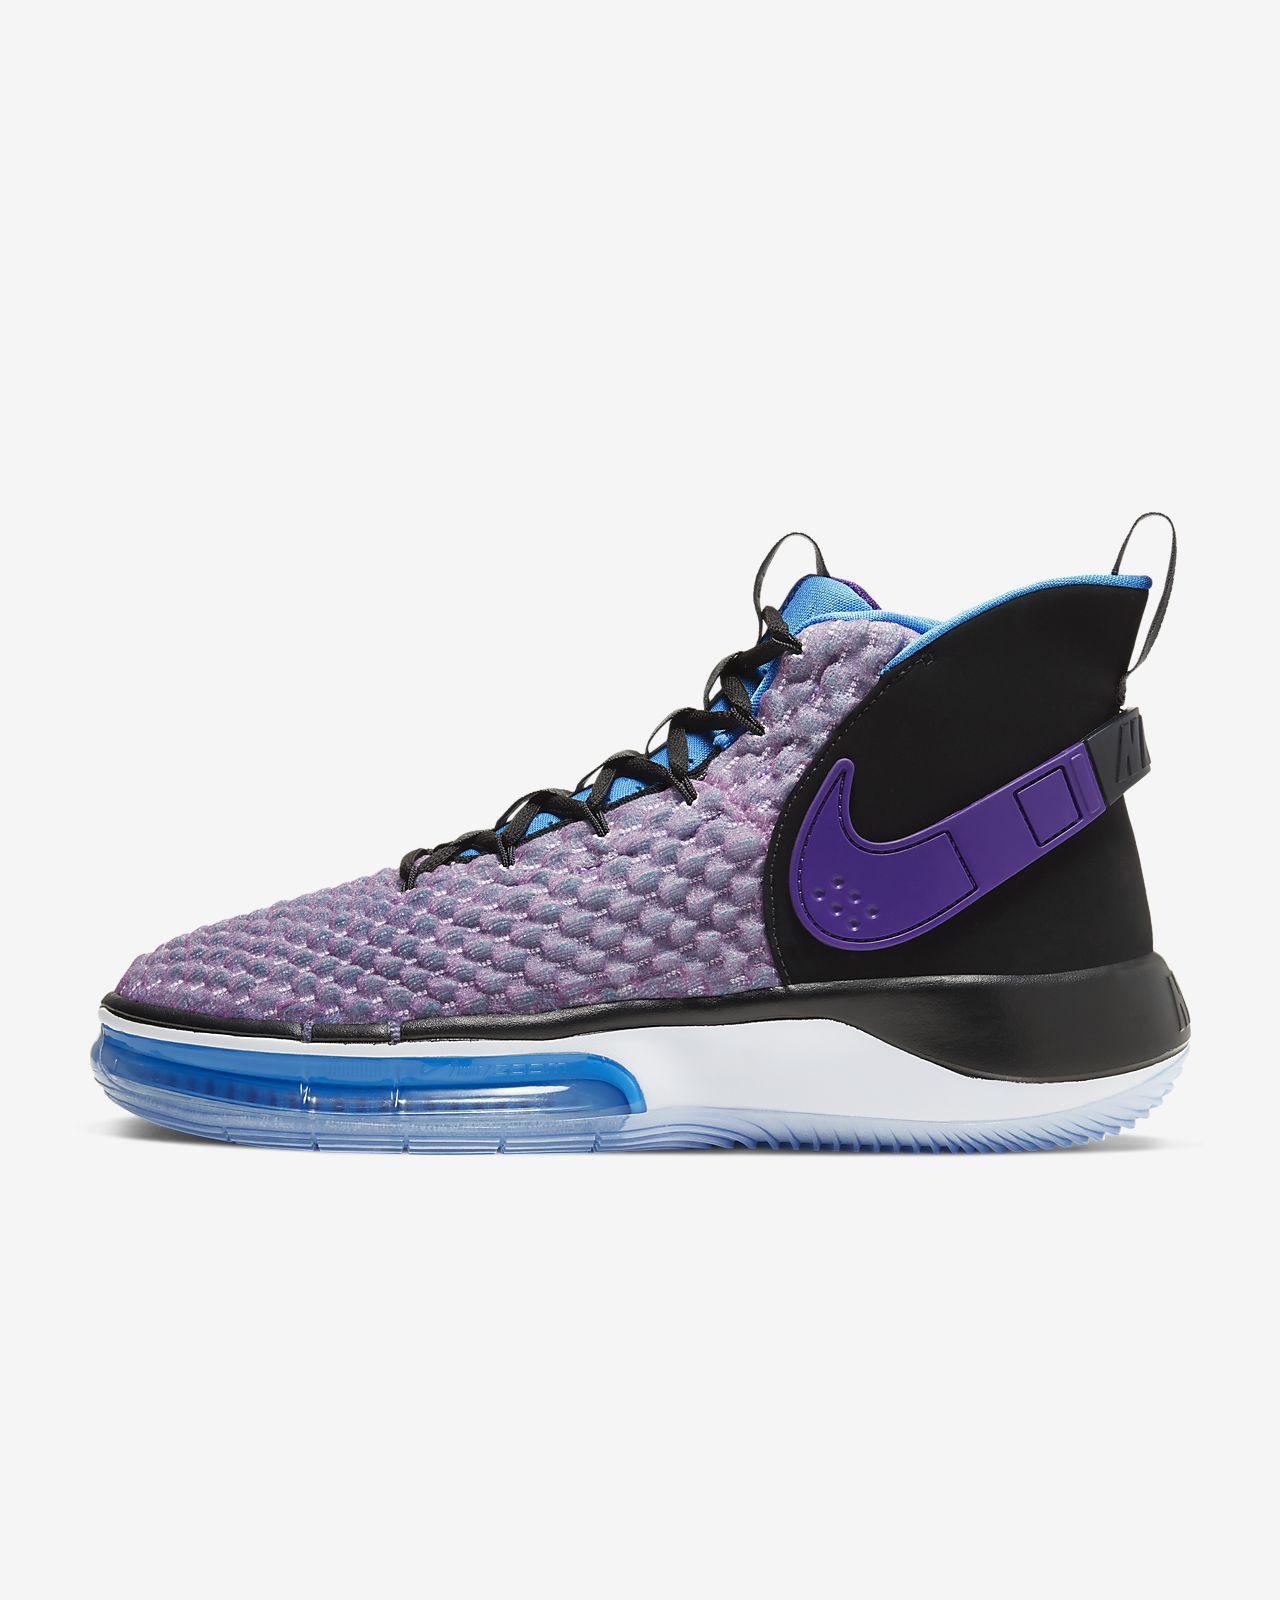 Nike AlphaDunk Basketball Shoe